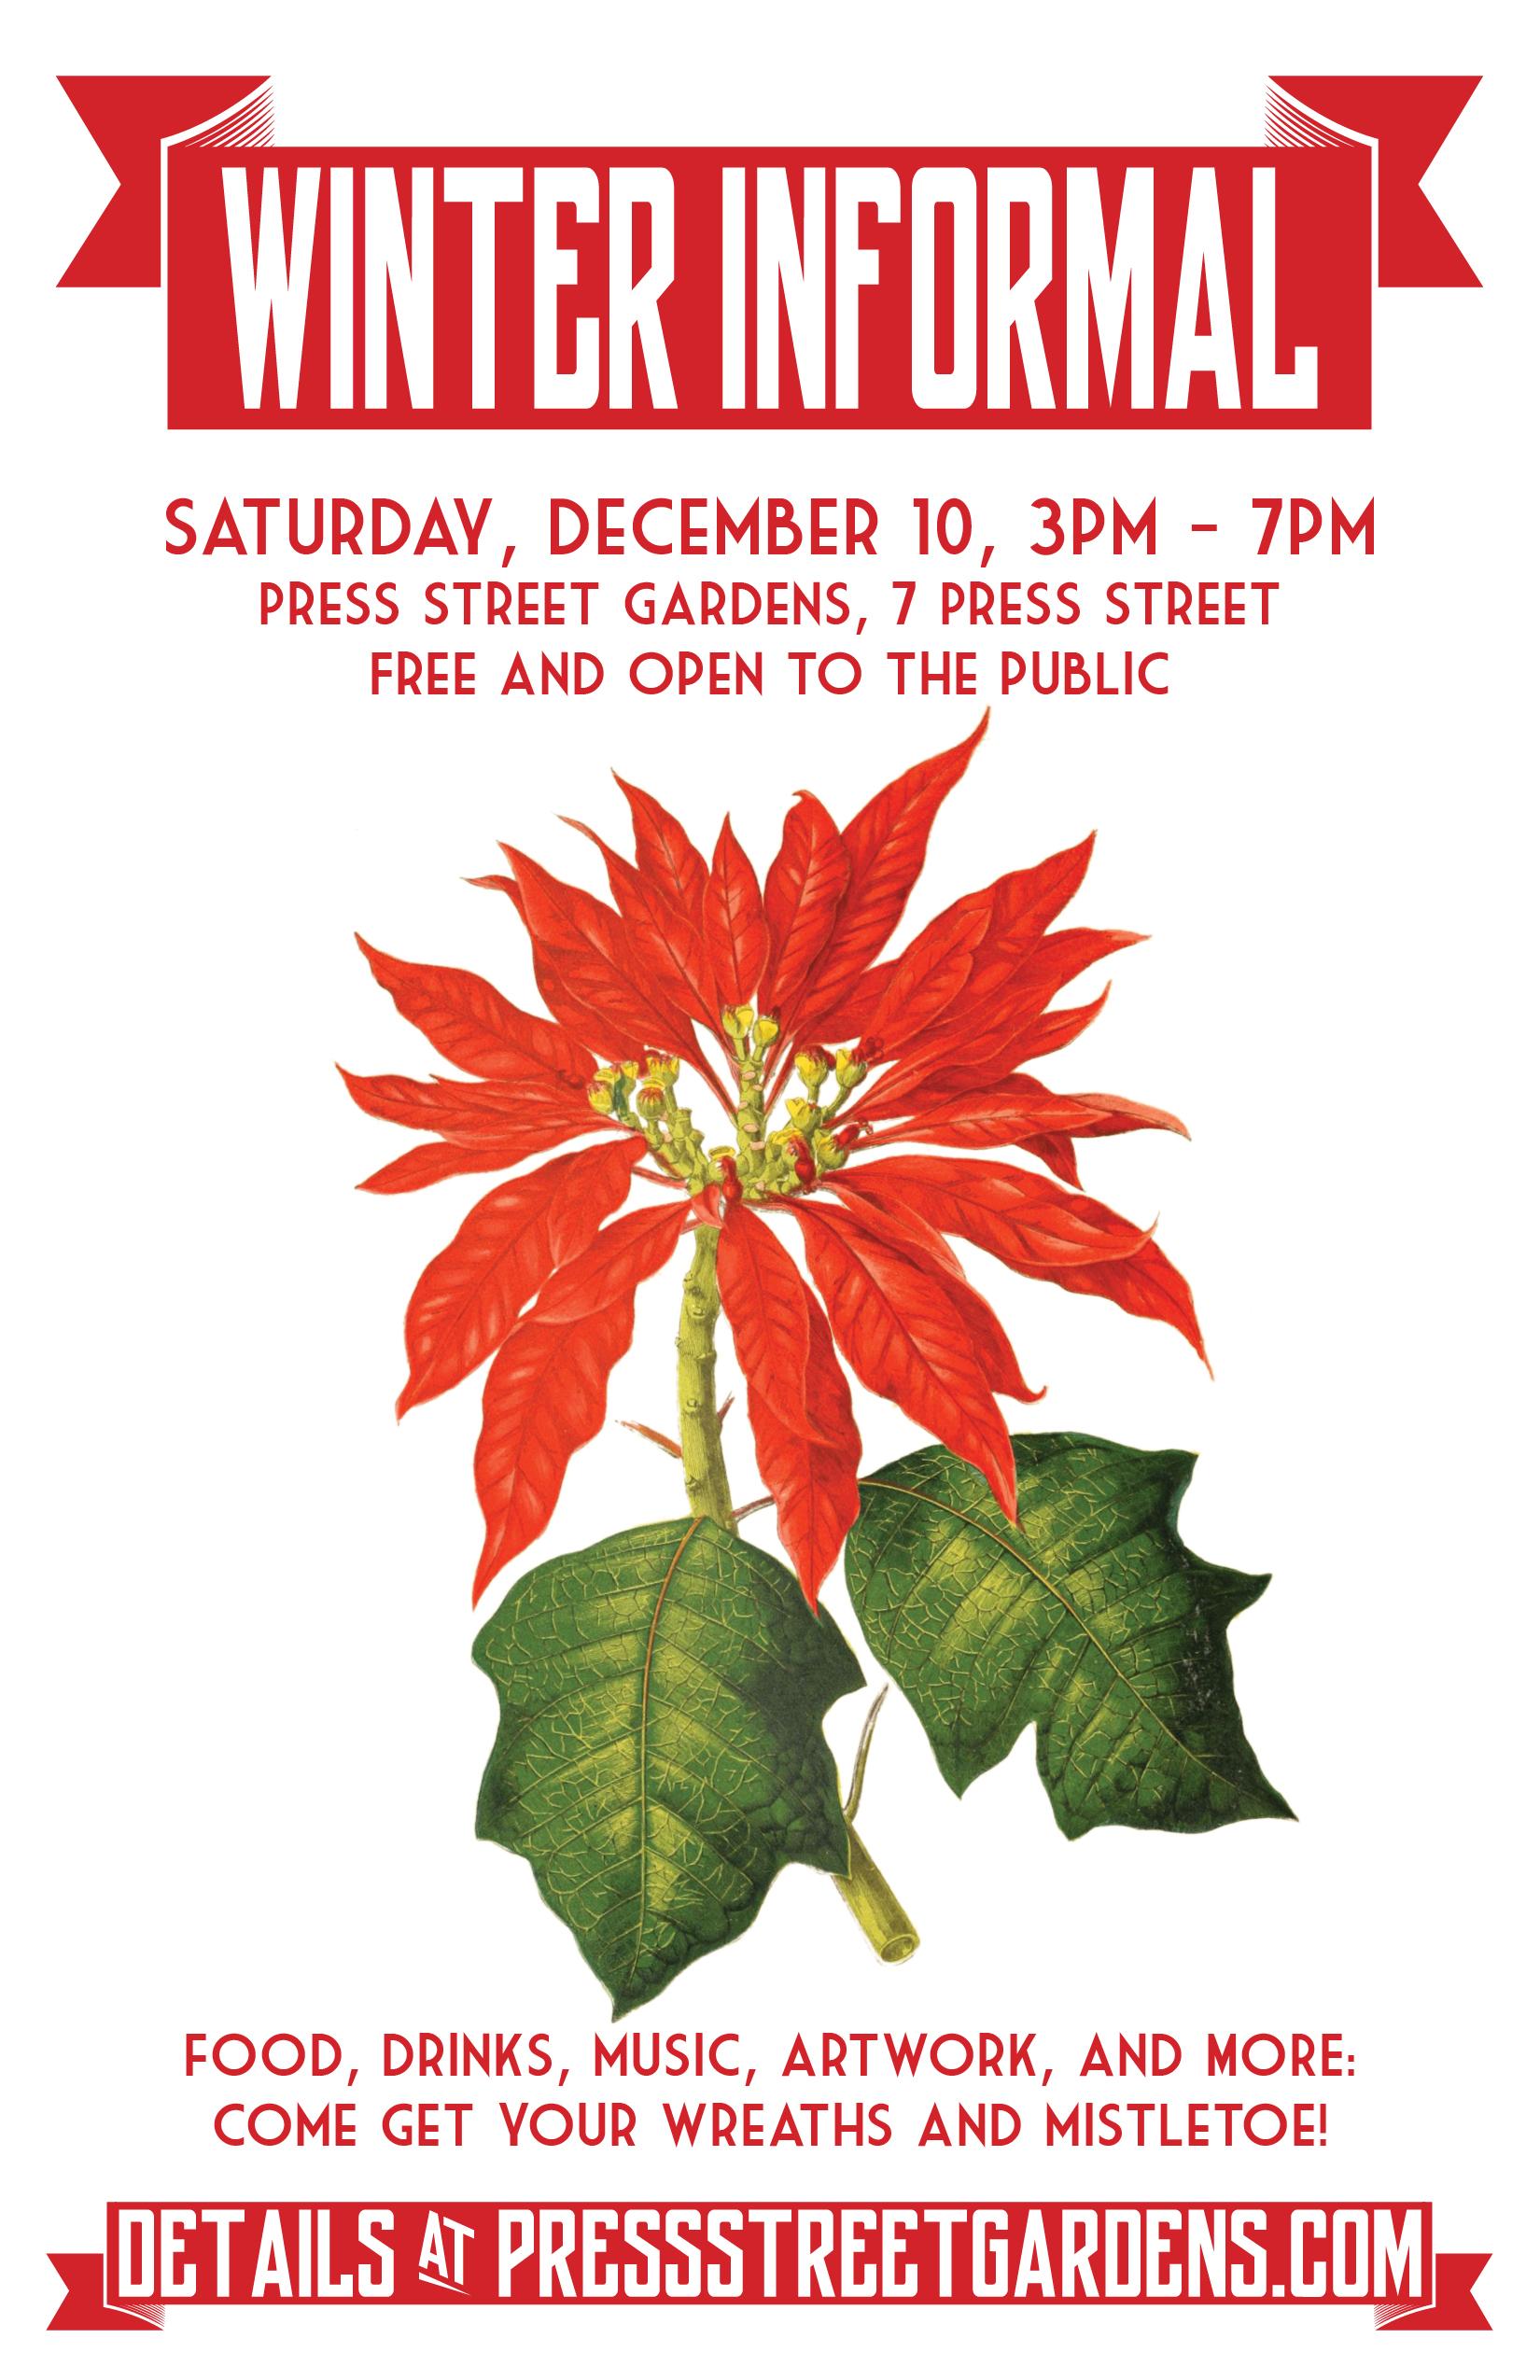 Saturday, December 10: Press Street Gardens' Winter Informal